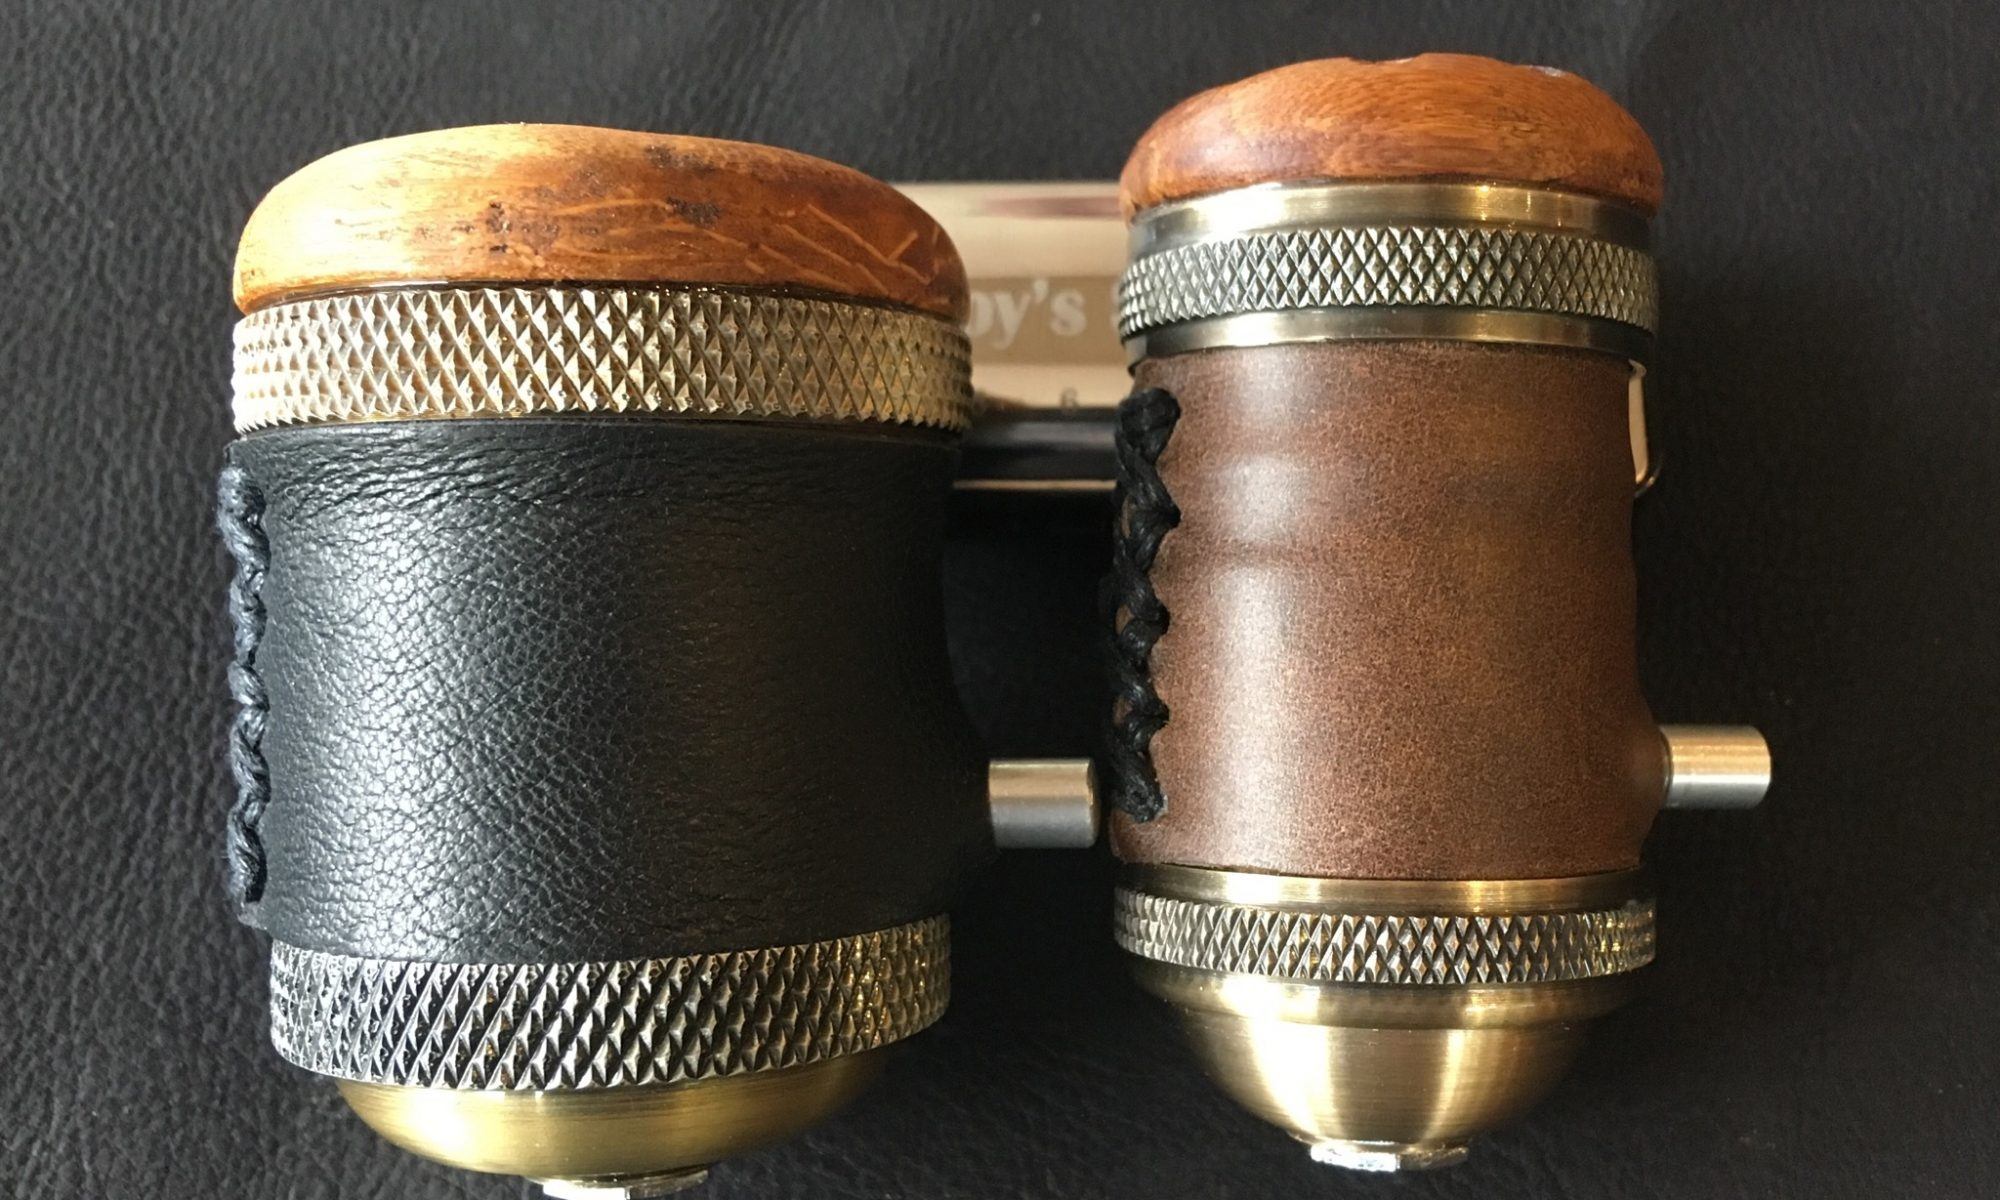 Leather-wrap upgrade